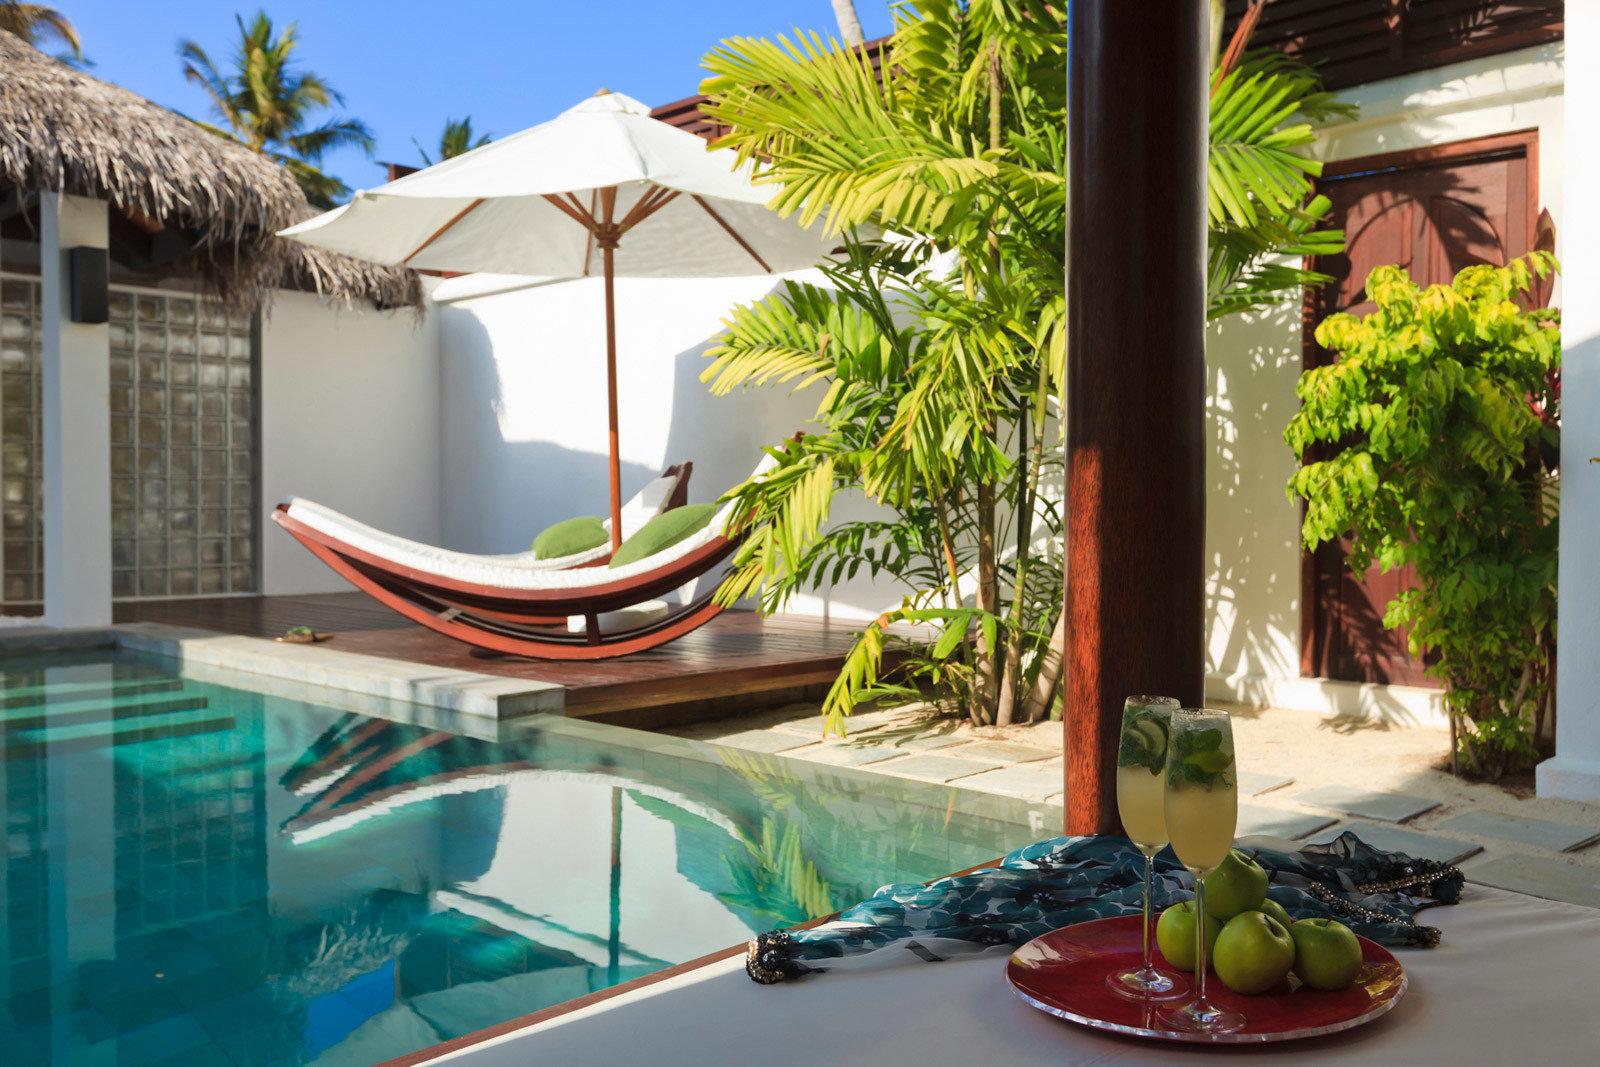 Hotels leisure swimming pool property Resort home Villa condominium Water park caribbean